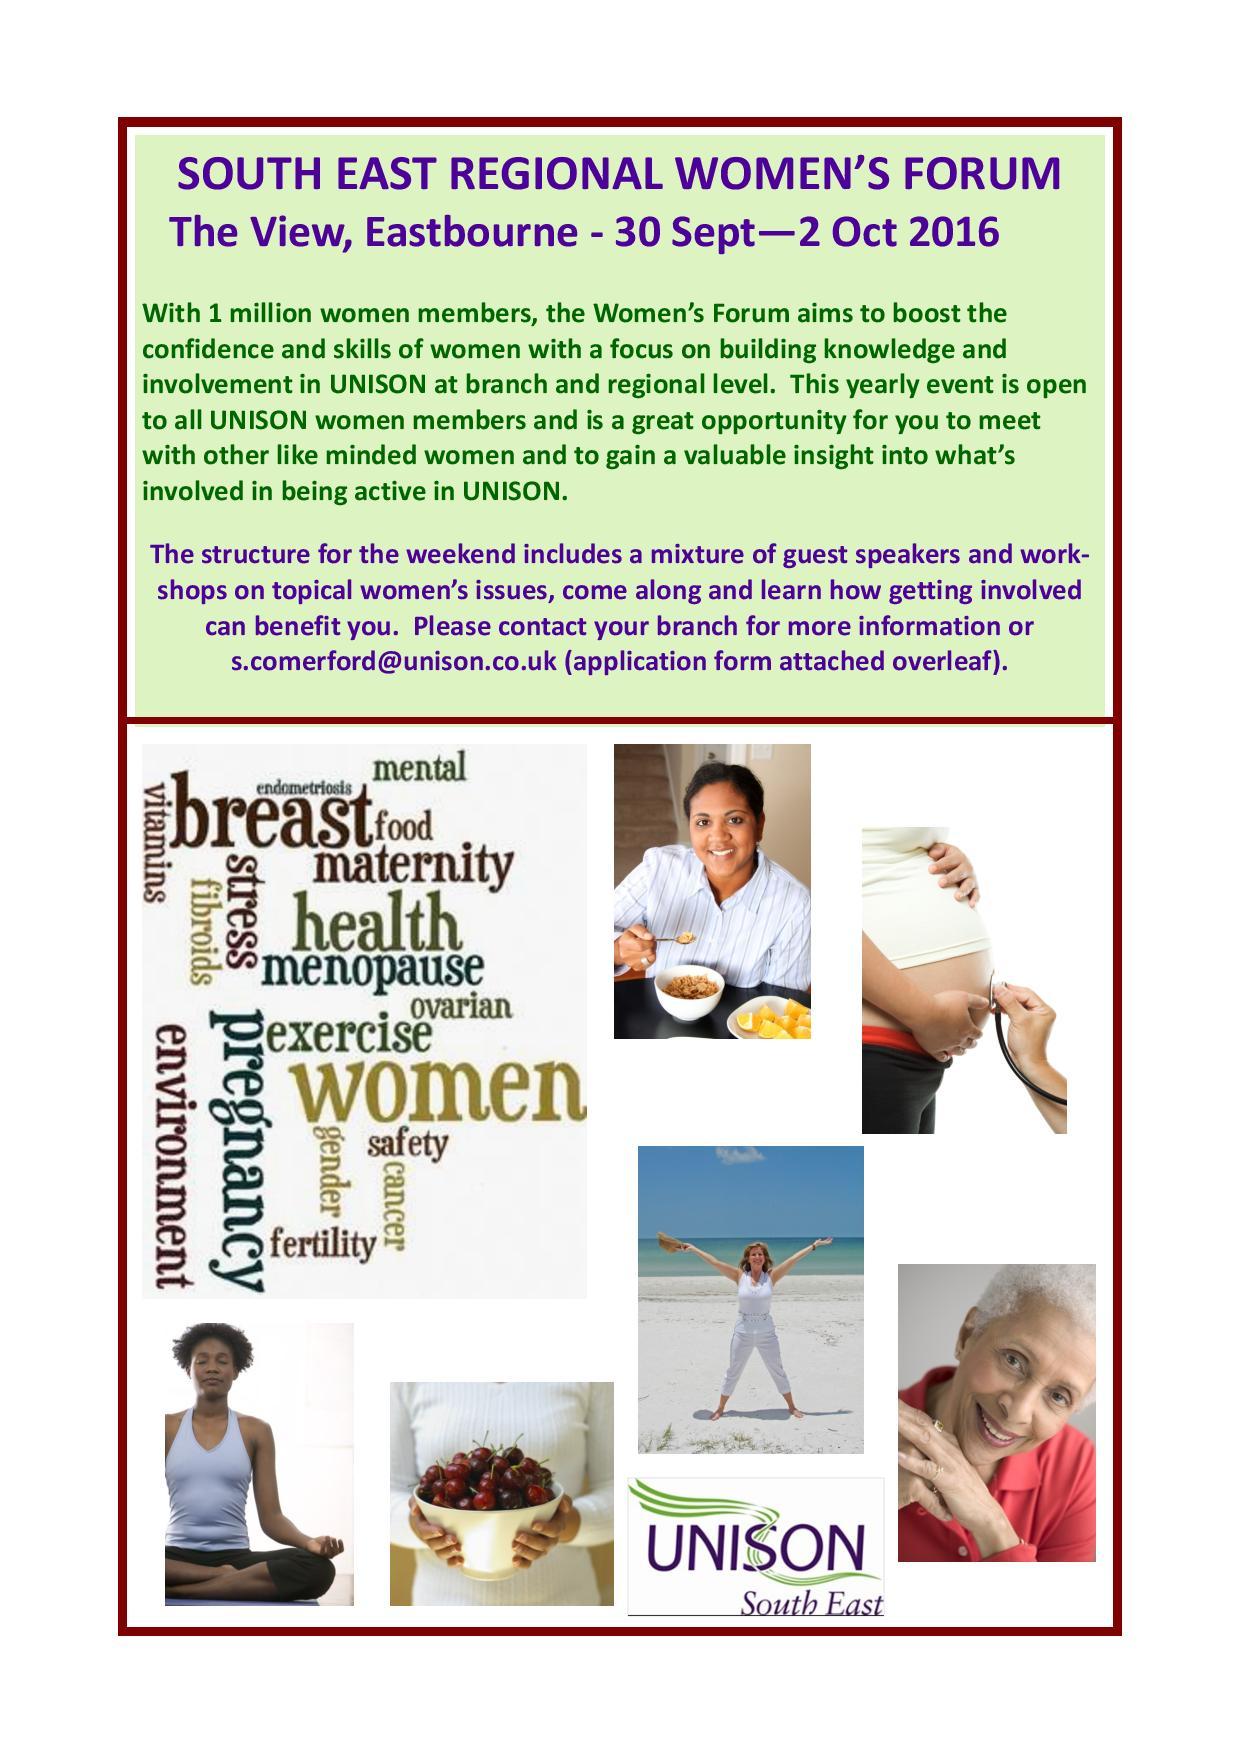 2016_Regional_Women_Forum_flyer_Provisional-page-001.jpg